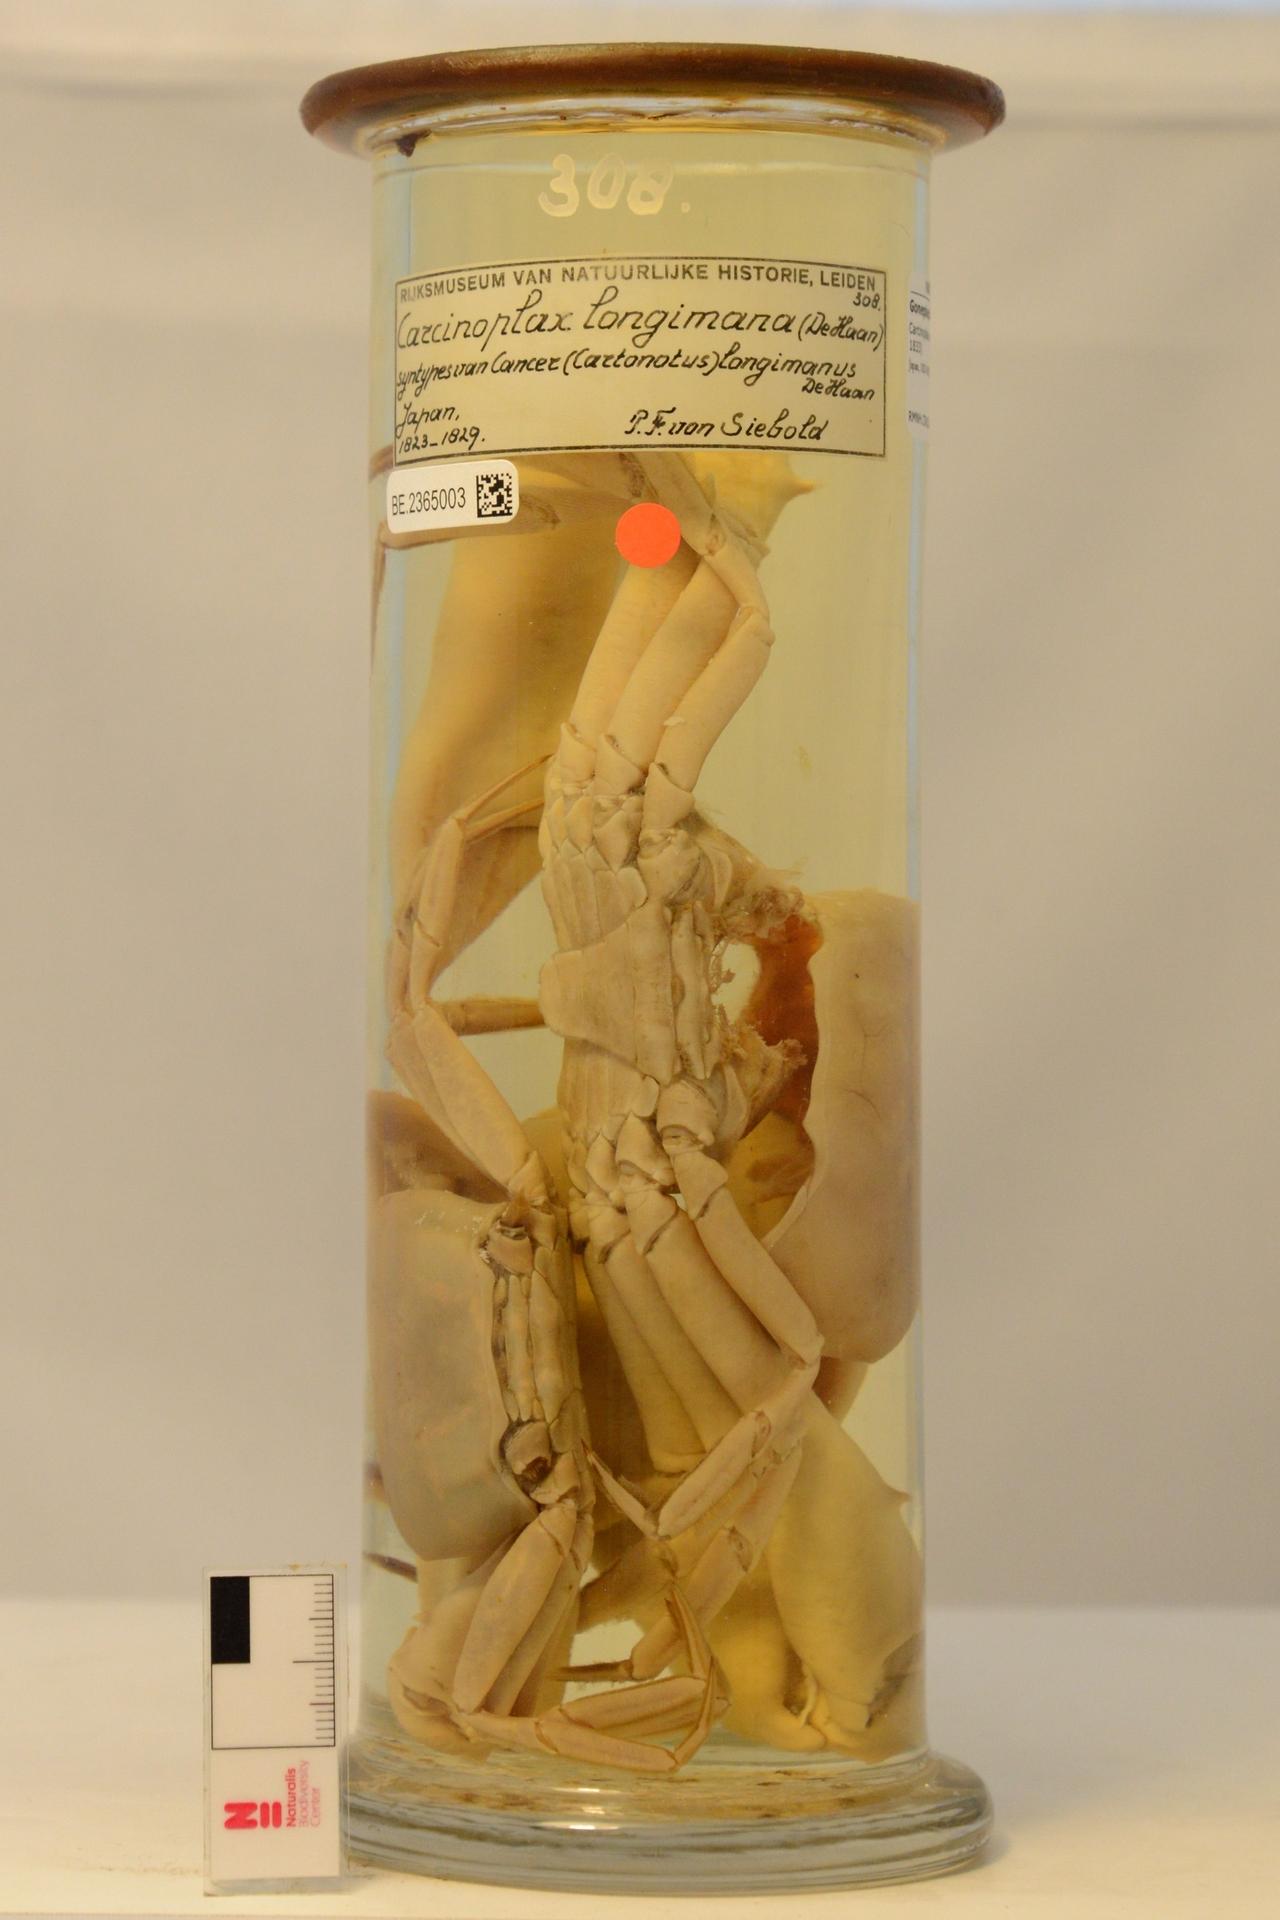 RMNH.CRUS.D.308   Carcinoplax longimanus (De Haan, 1833)